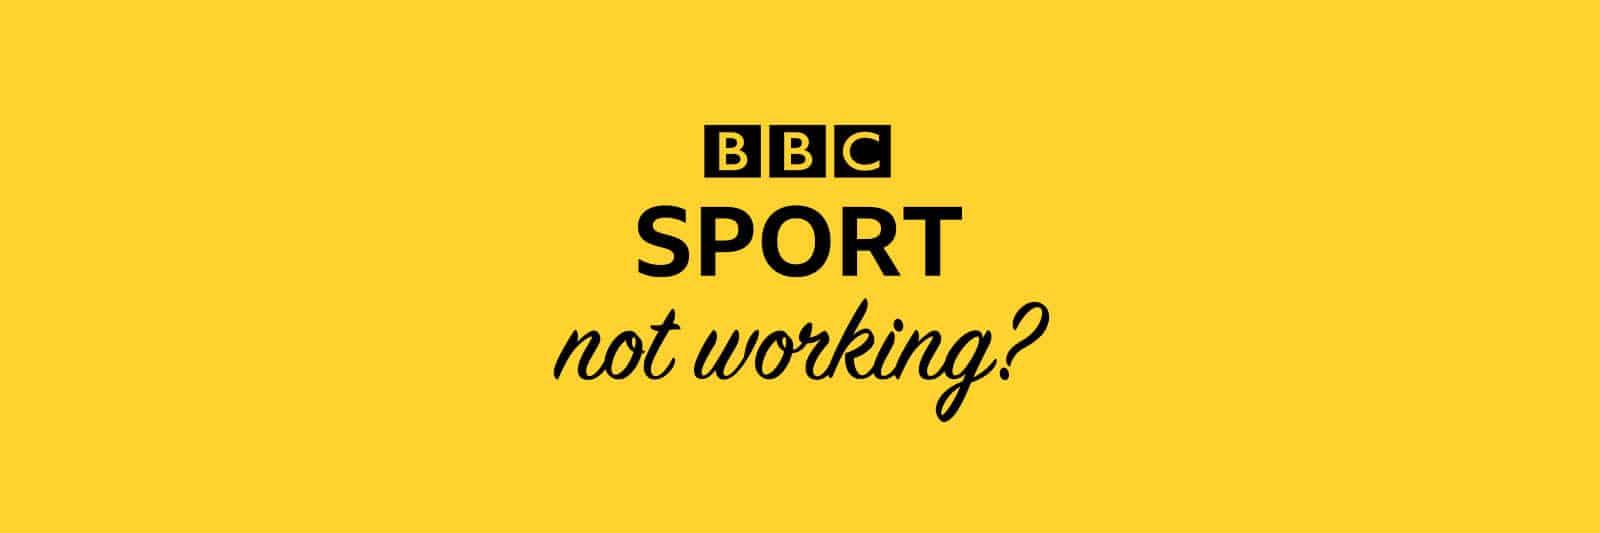 bbc-sport-not-working